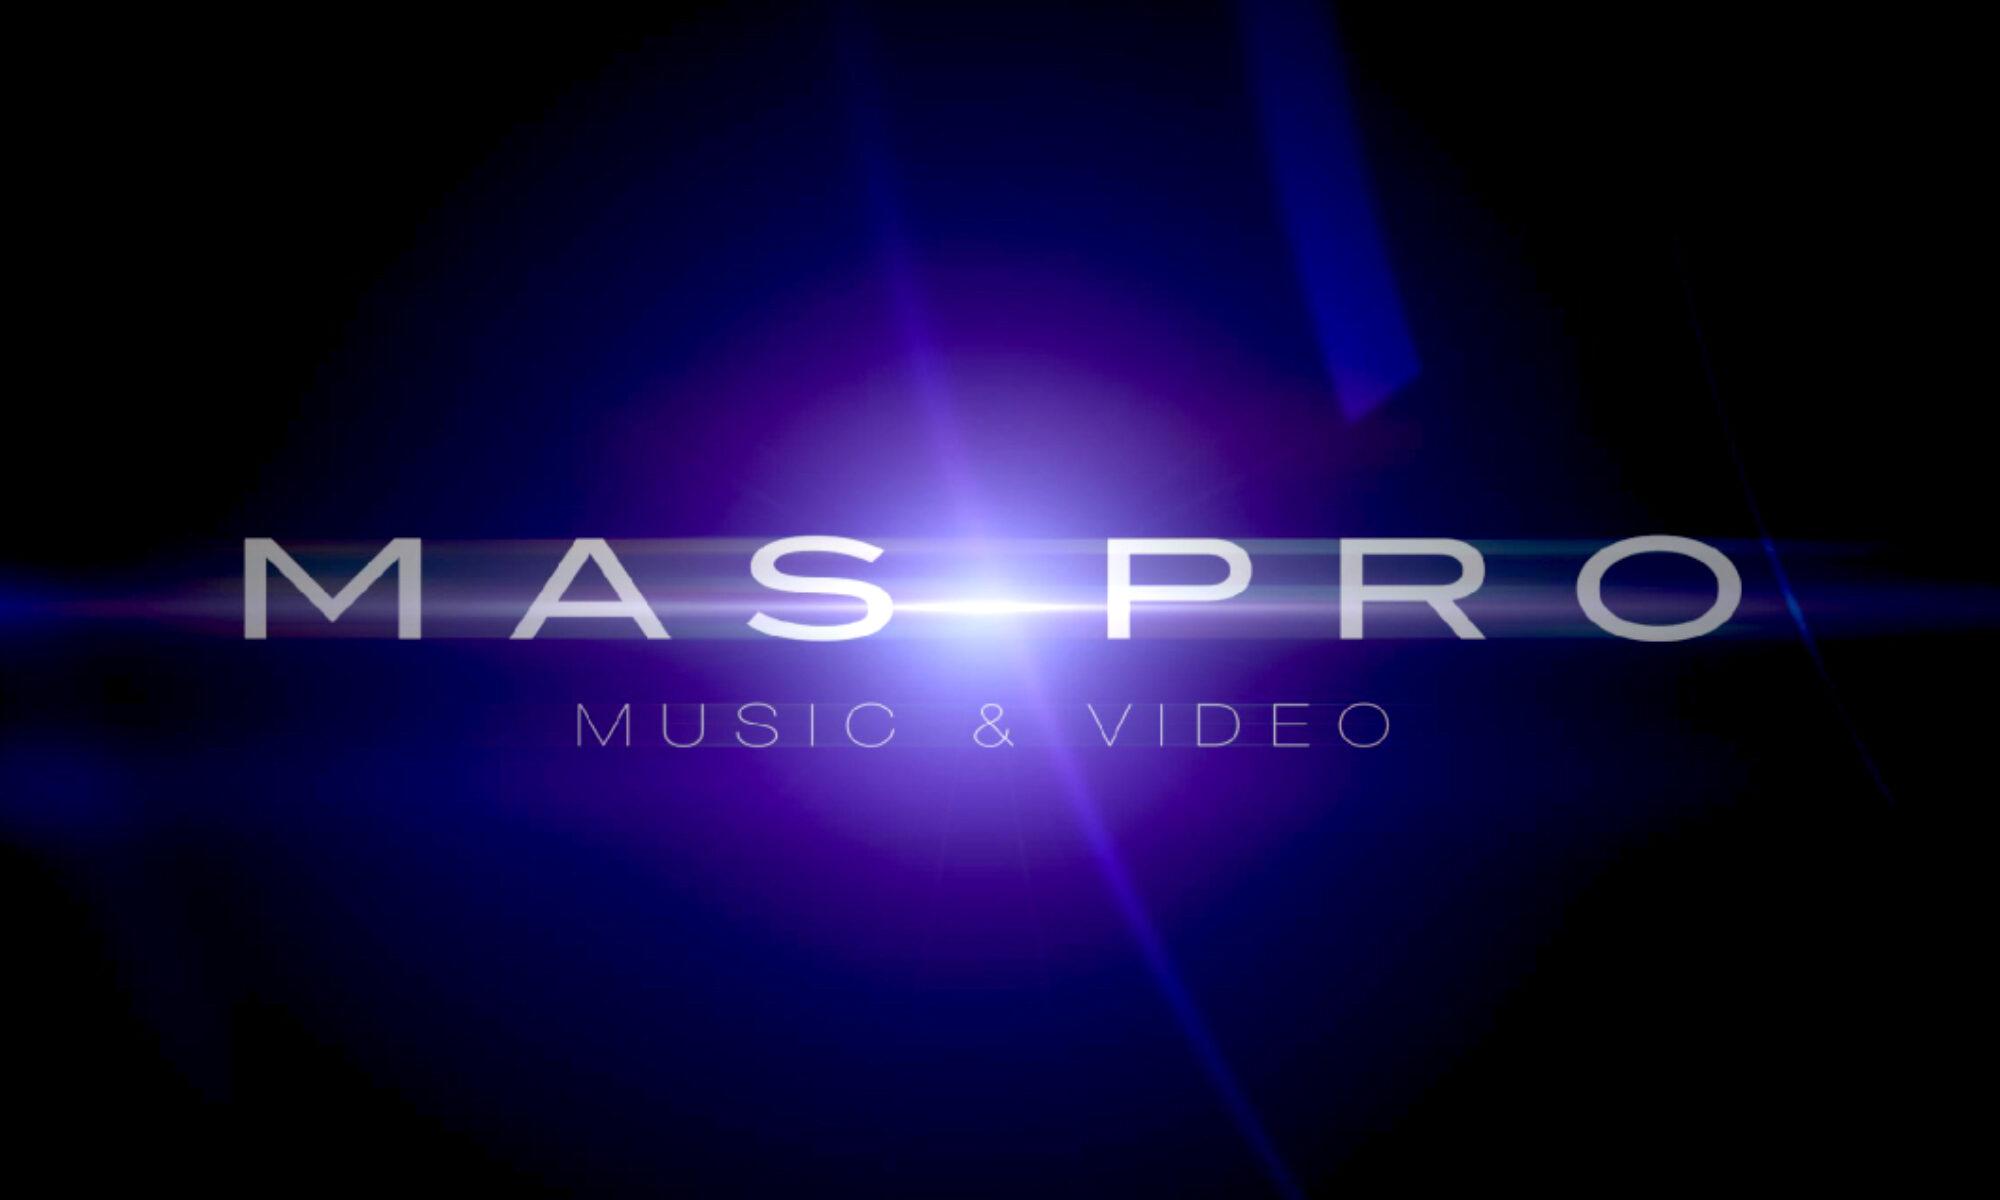 MAS PRO MUSIC - NEWS